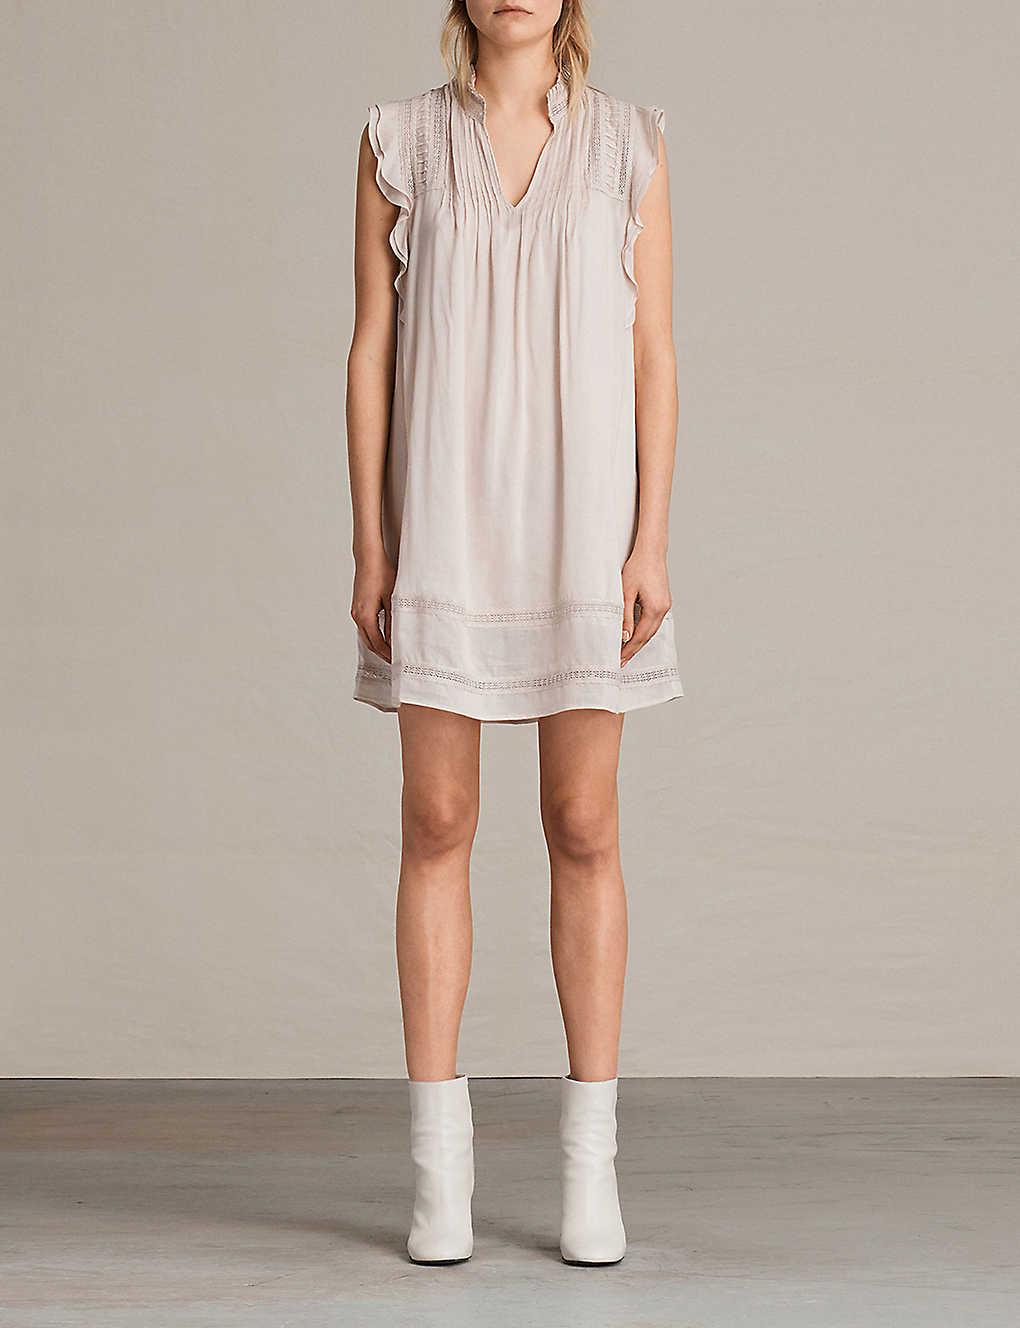 ALLSAINTS - Evelina swing dress | Selfridges com